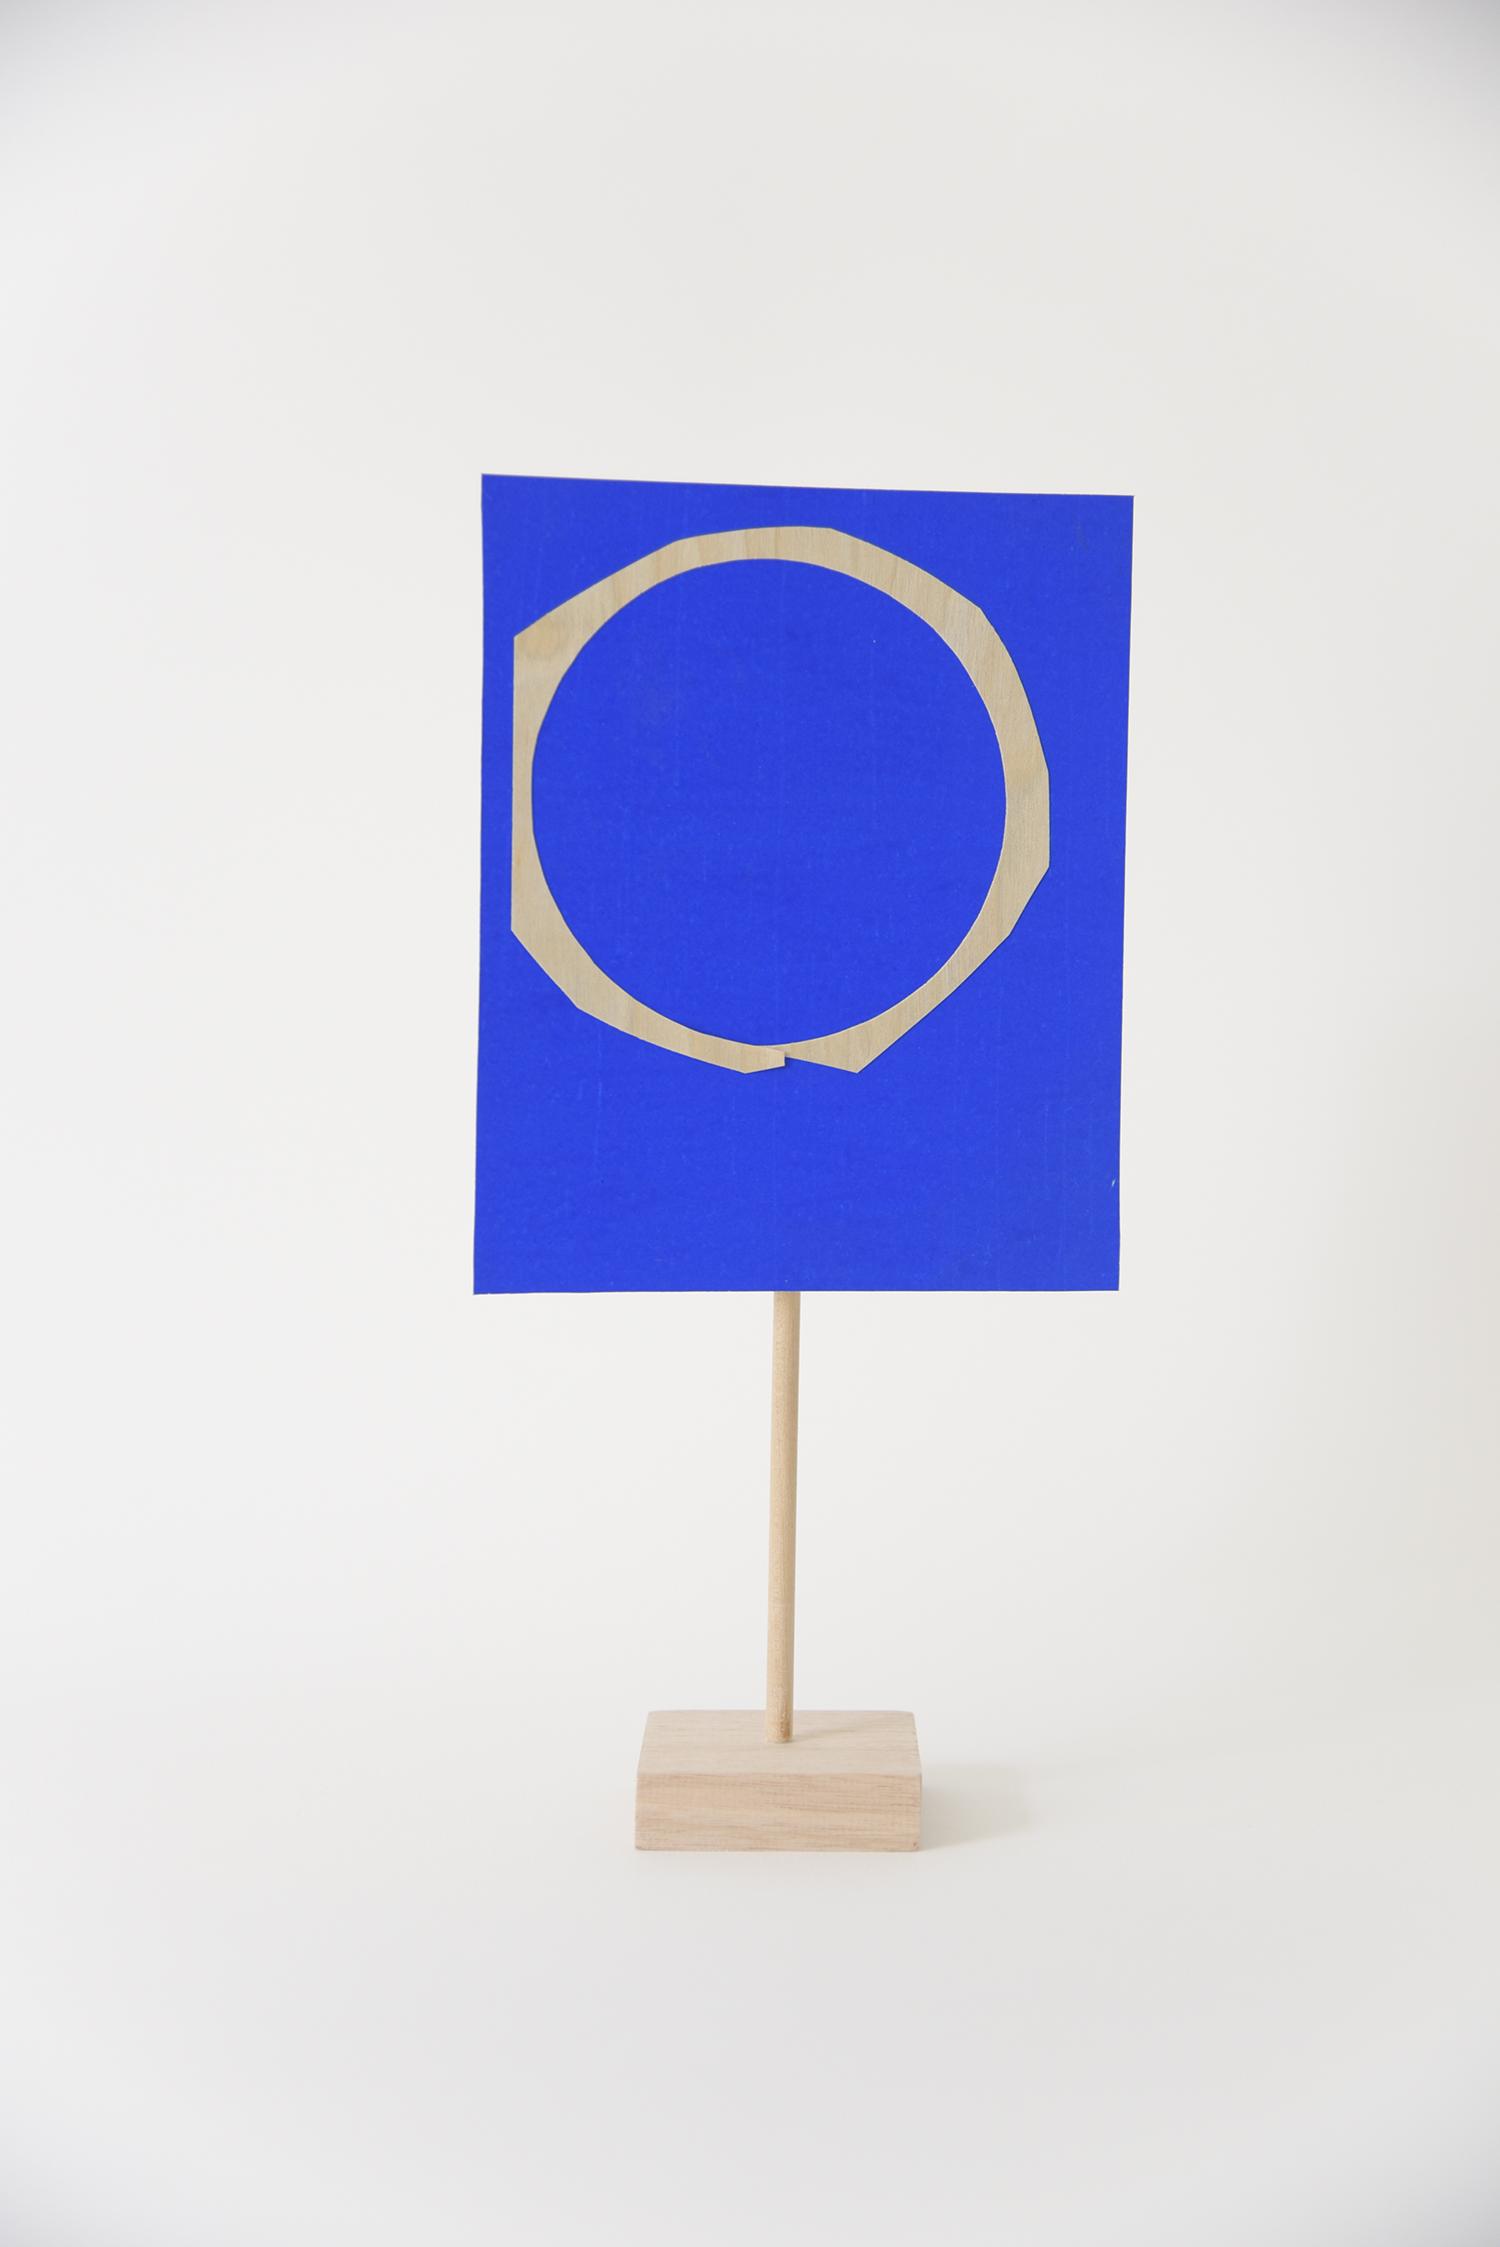 Hardbody Sculpture (Object) X